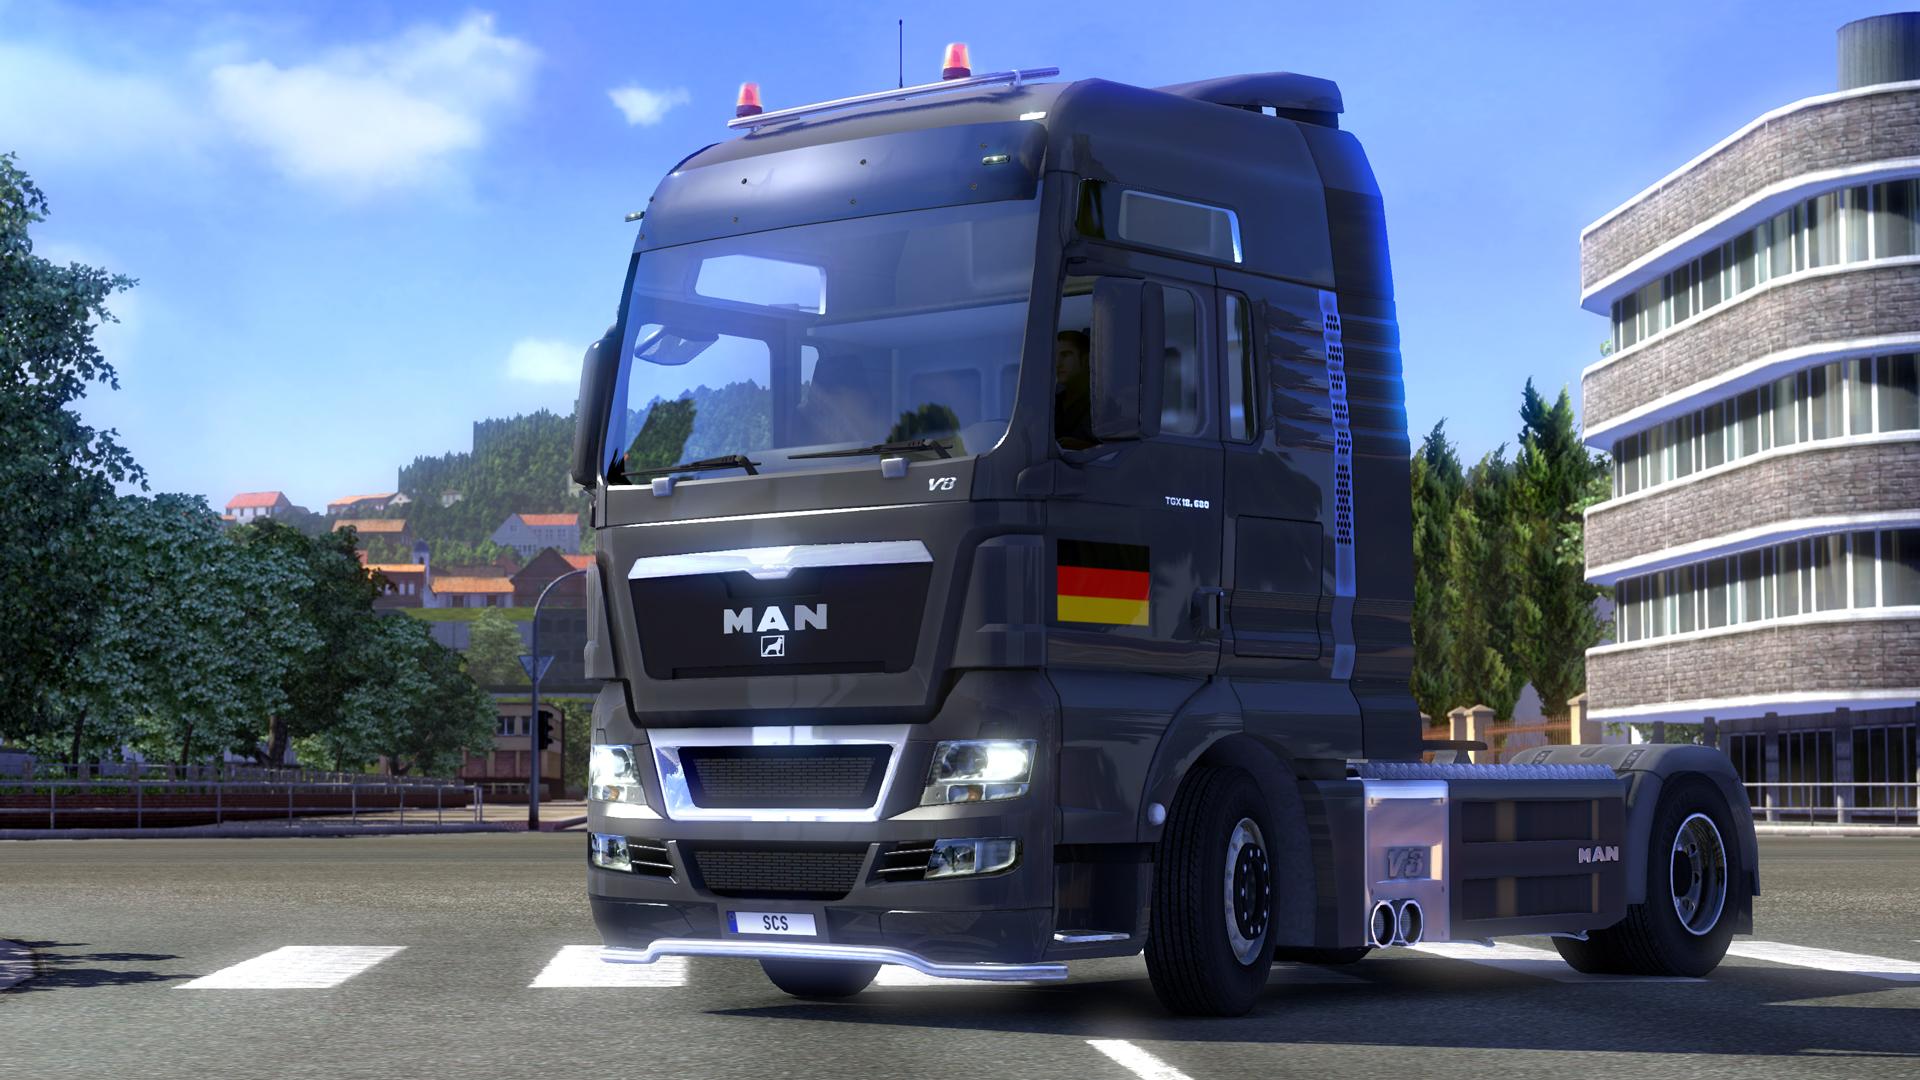 Euro truck simulator 2 - spanish paint jobs pack download free online